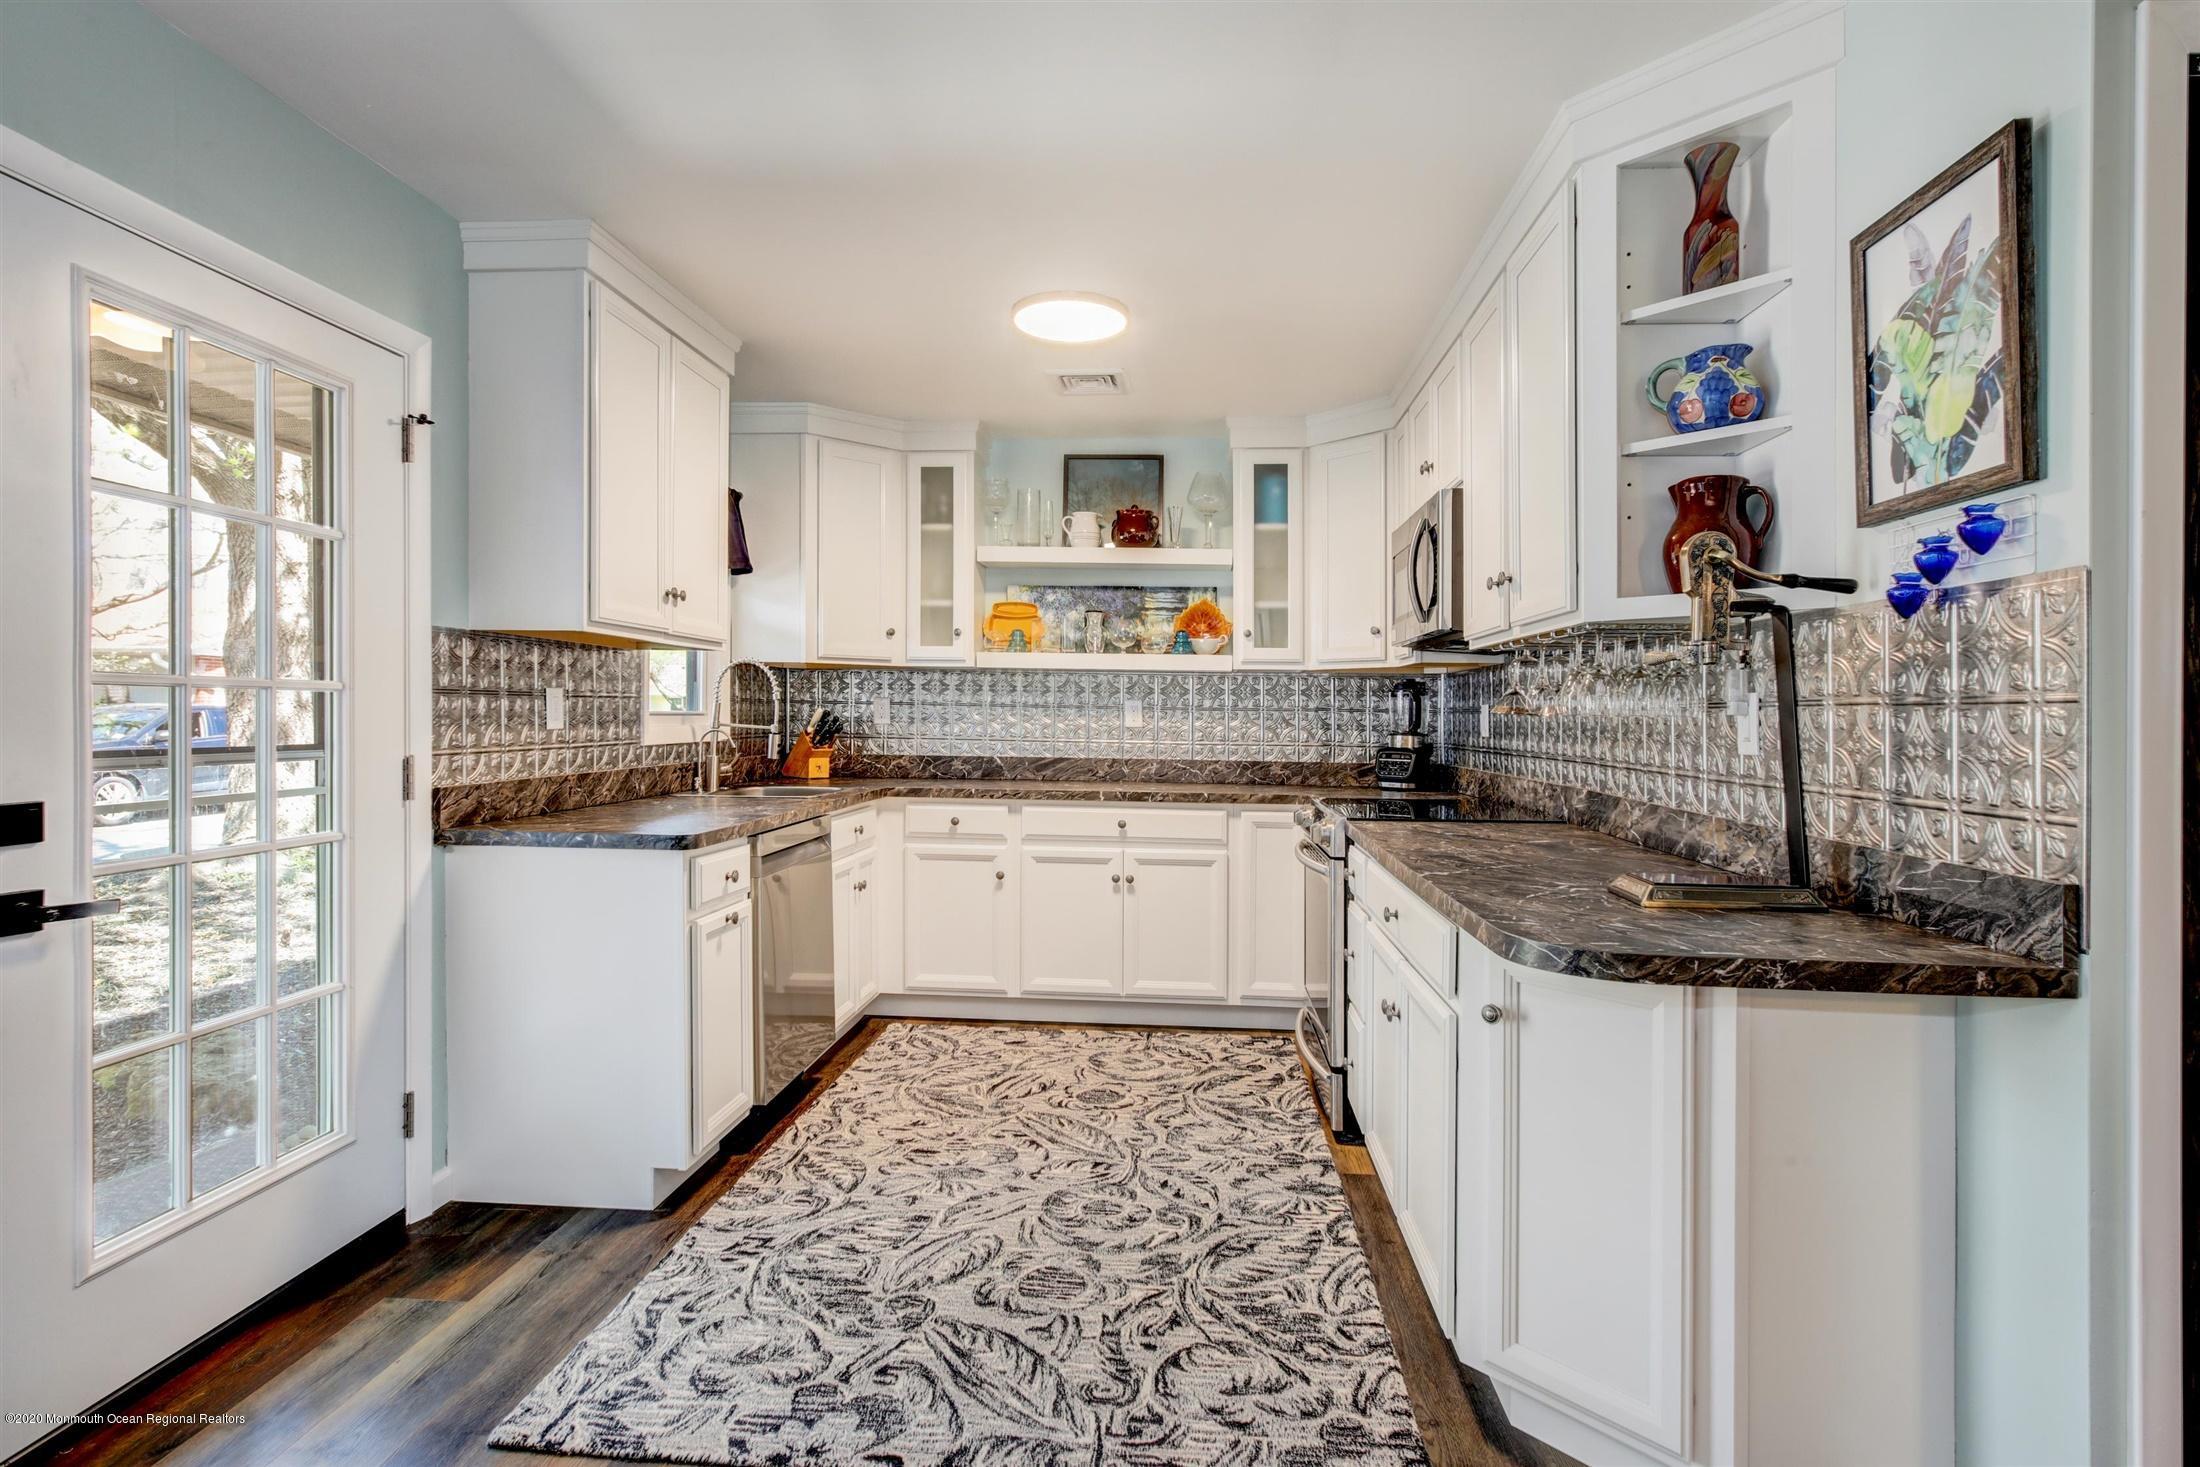 Adult Community Homes For Sale In Leisure Village Lakewood Nj